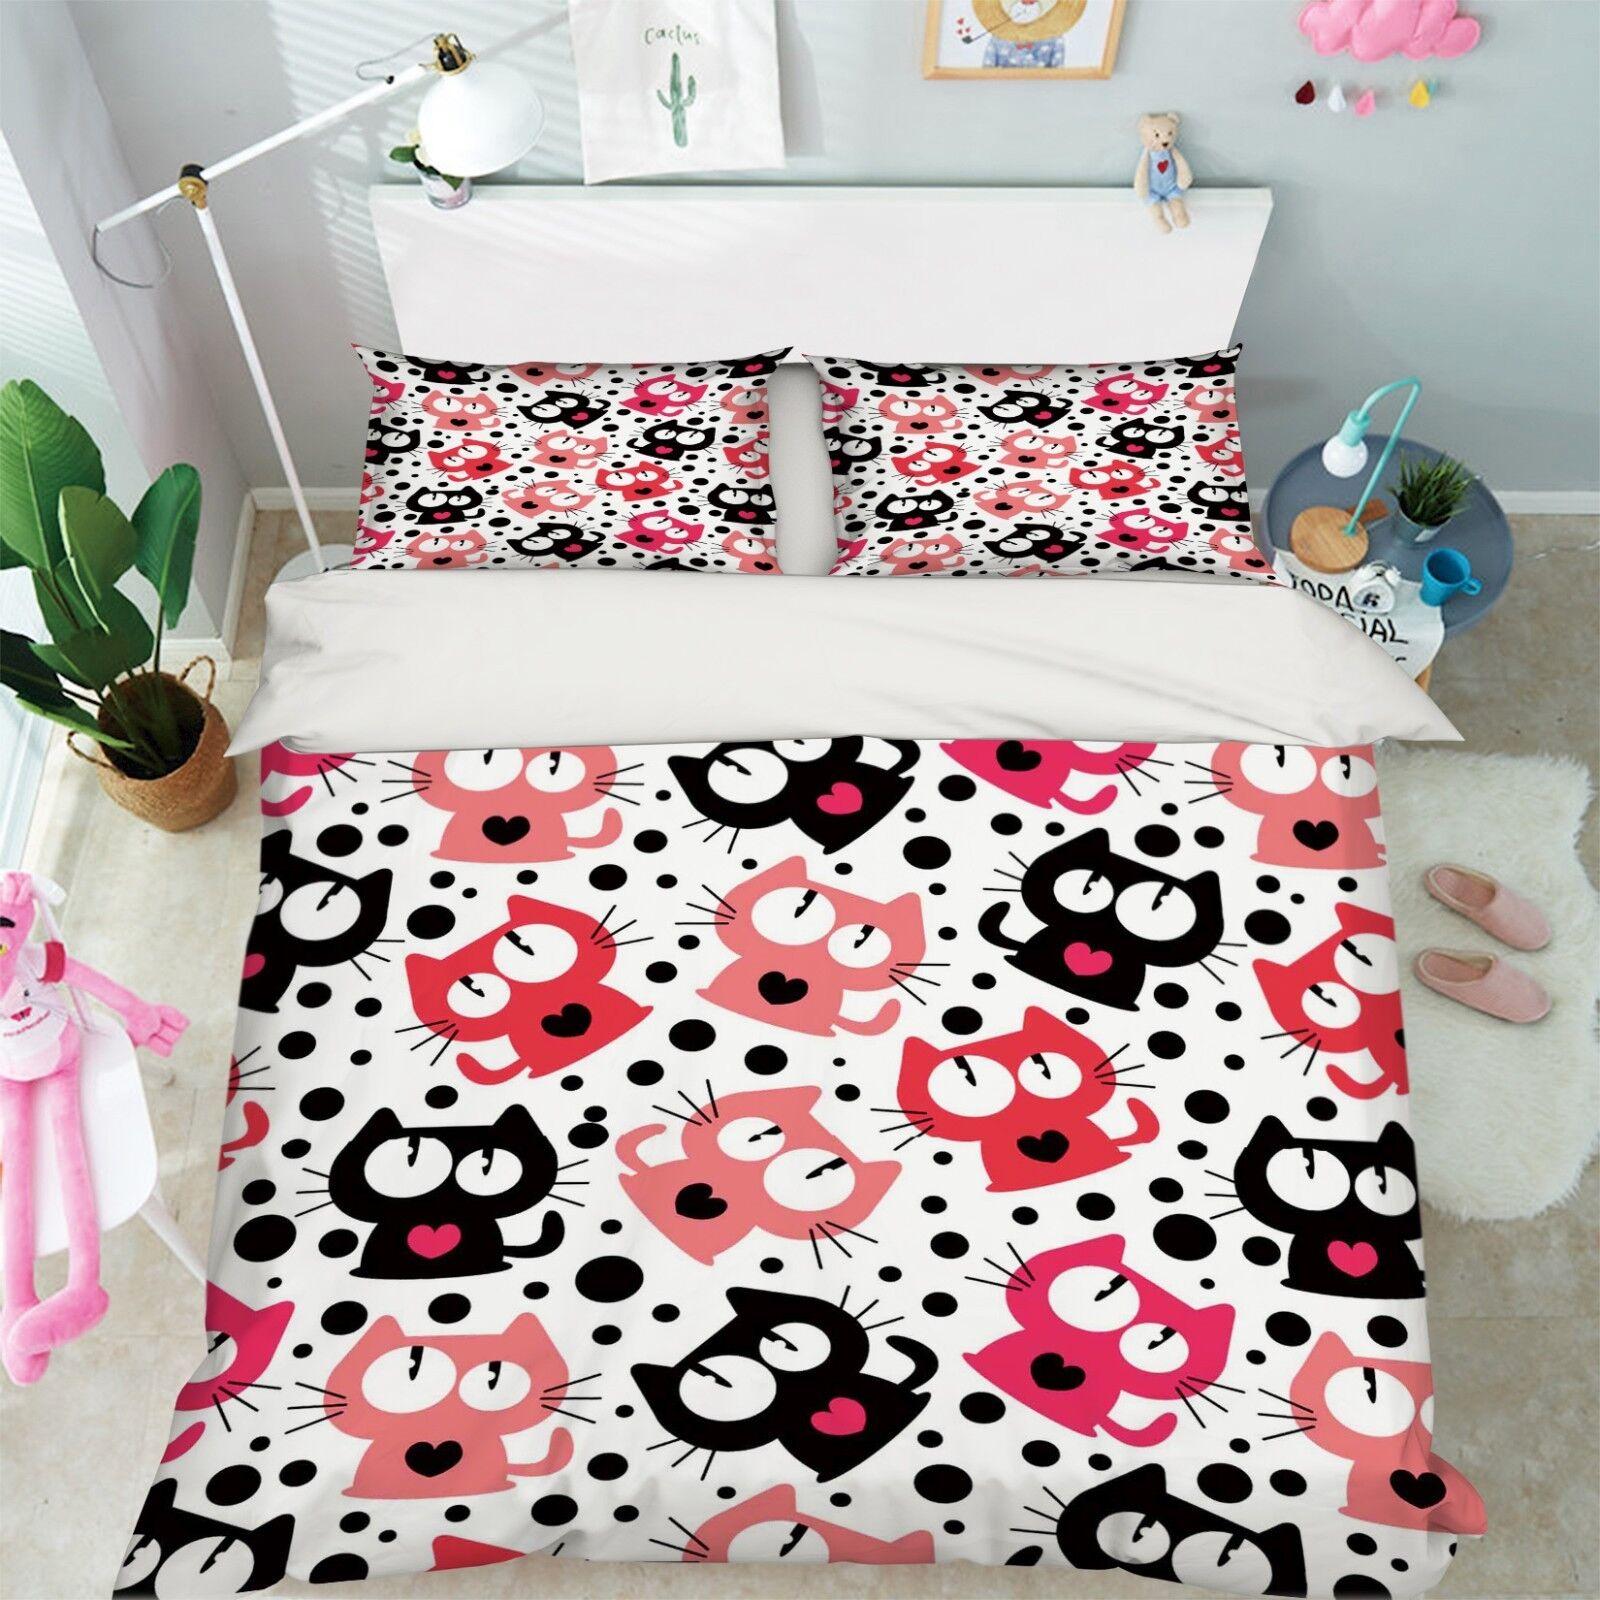 3D Cartoon Cat 6 Bed Pillowcases Quilt Duvet Cover Set Single Queen King AU Cobb